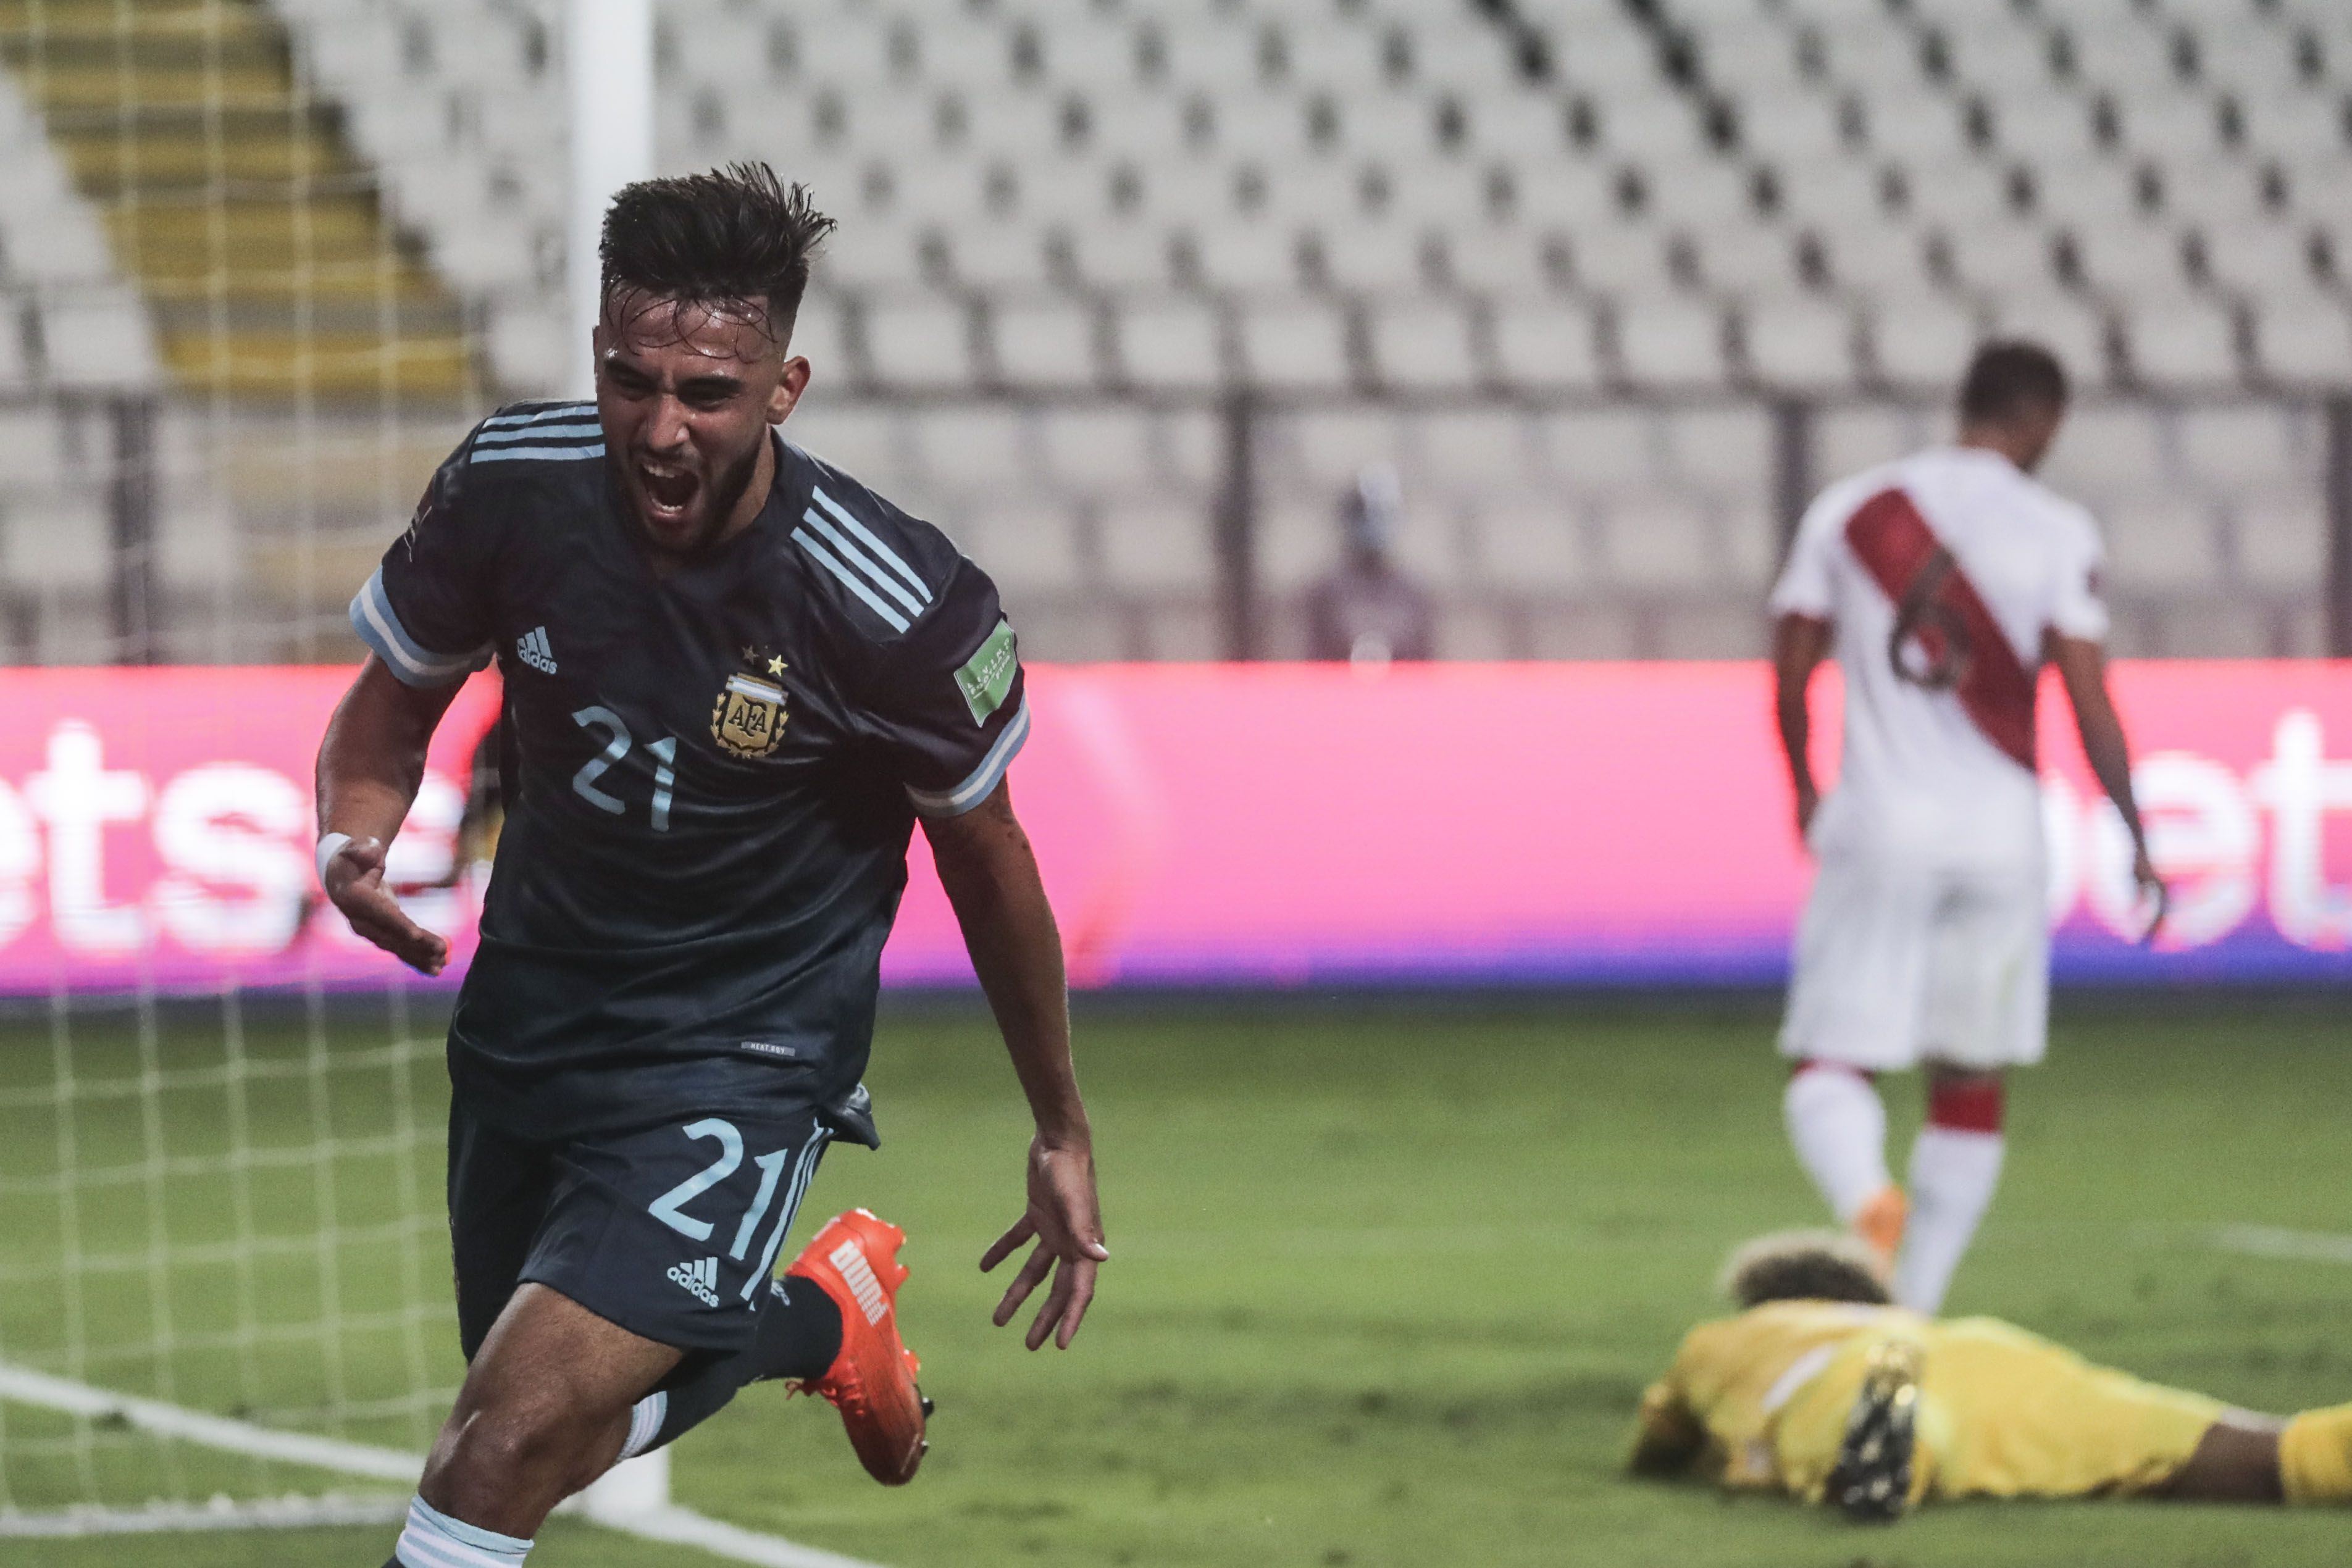 Nicolás González anotó el primer gol de Argentina en el 2-0 ante Perú. (Foto: AFP)